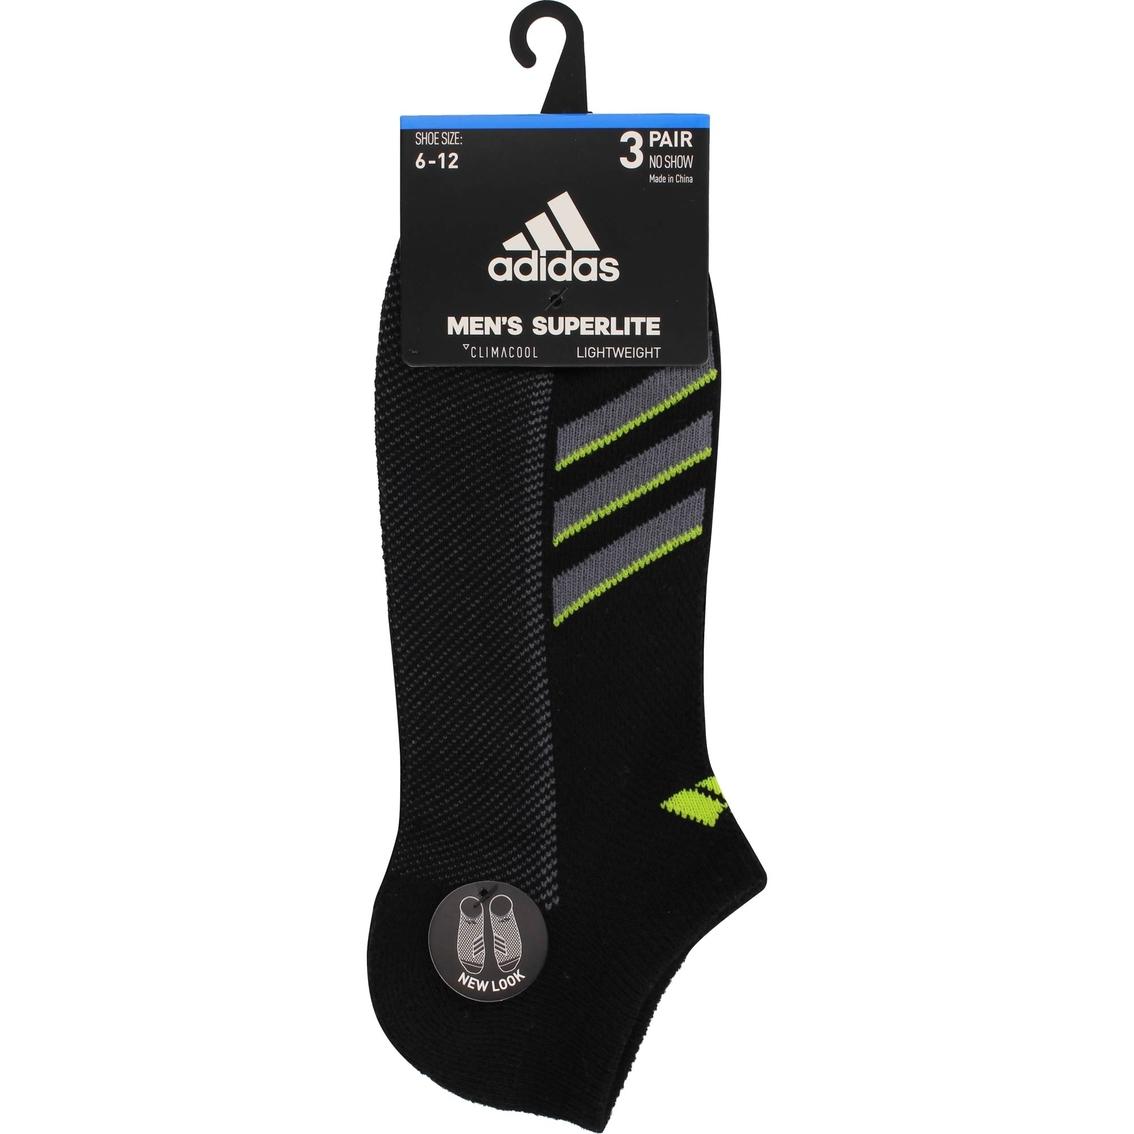 4bc930b0c2a51 Adidas Men's Climacool Superlite Stripe No Show Socks 3 Pk. | Socks ...